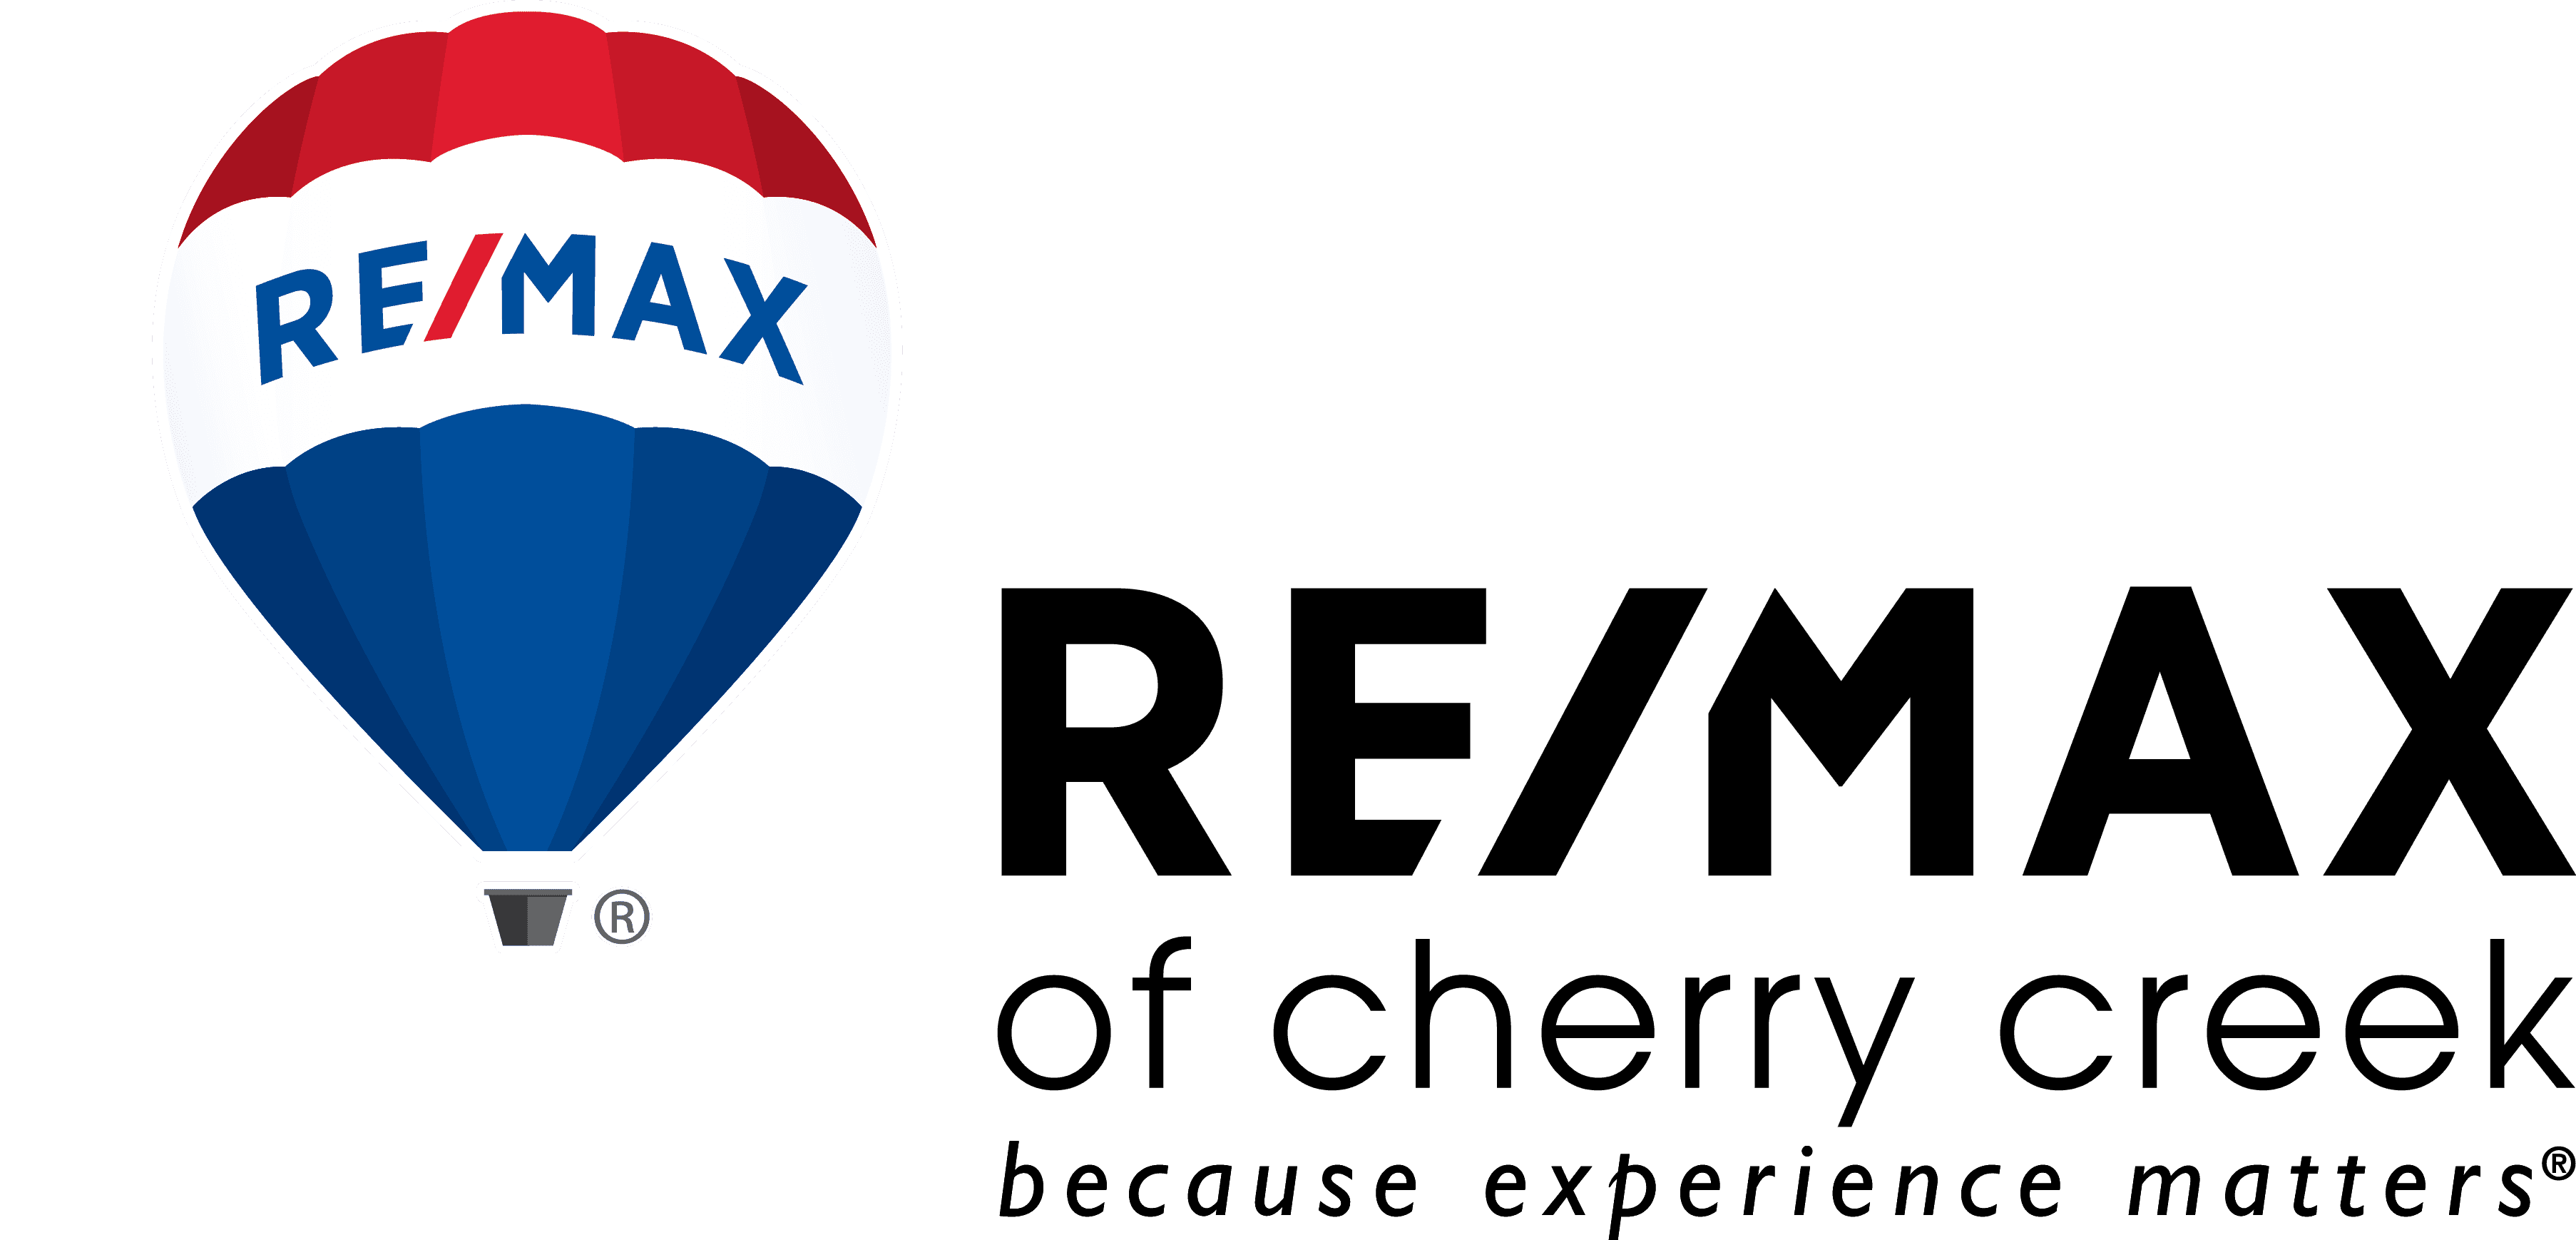 RE/MAX Cherry Creek